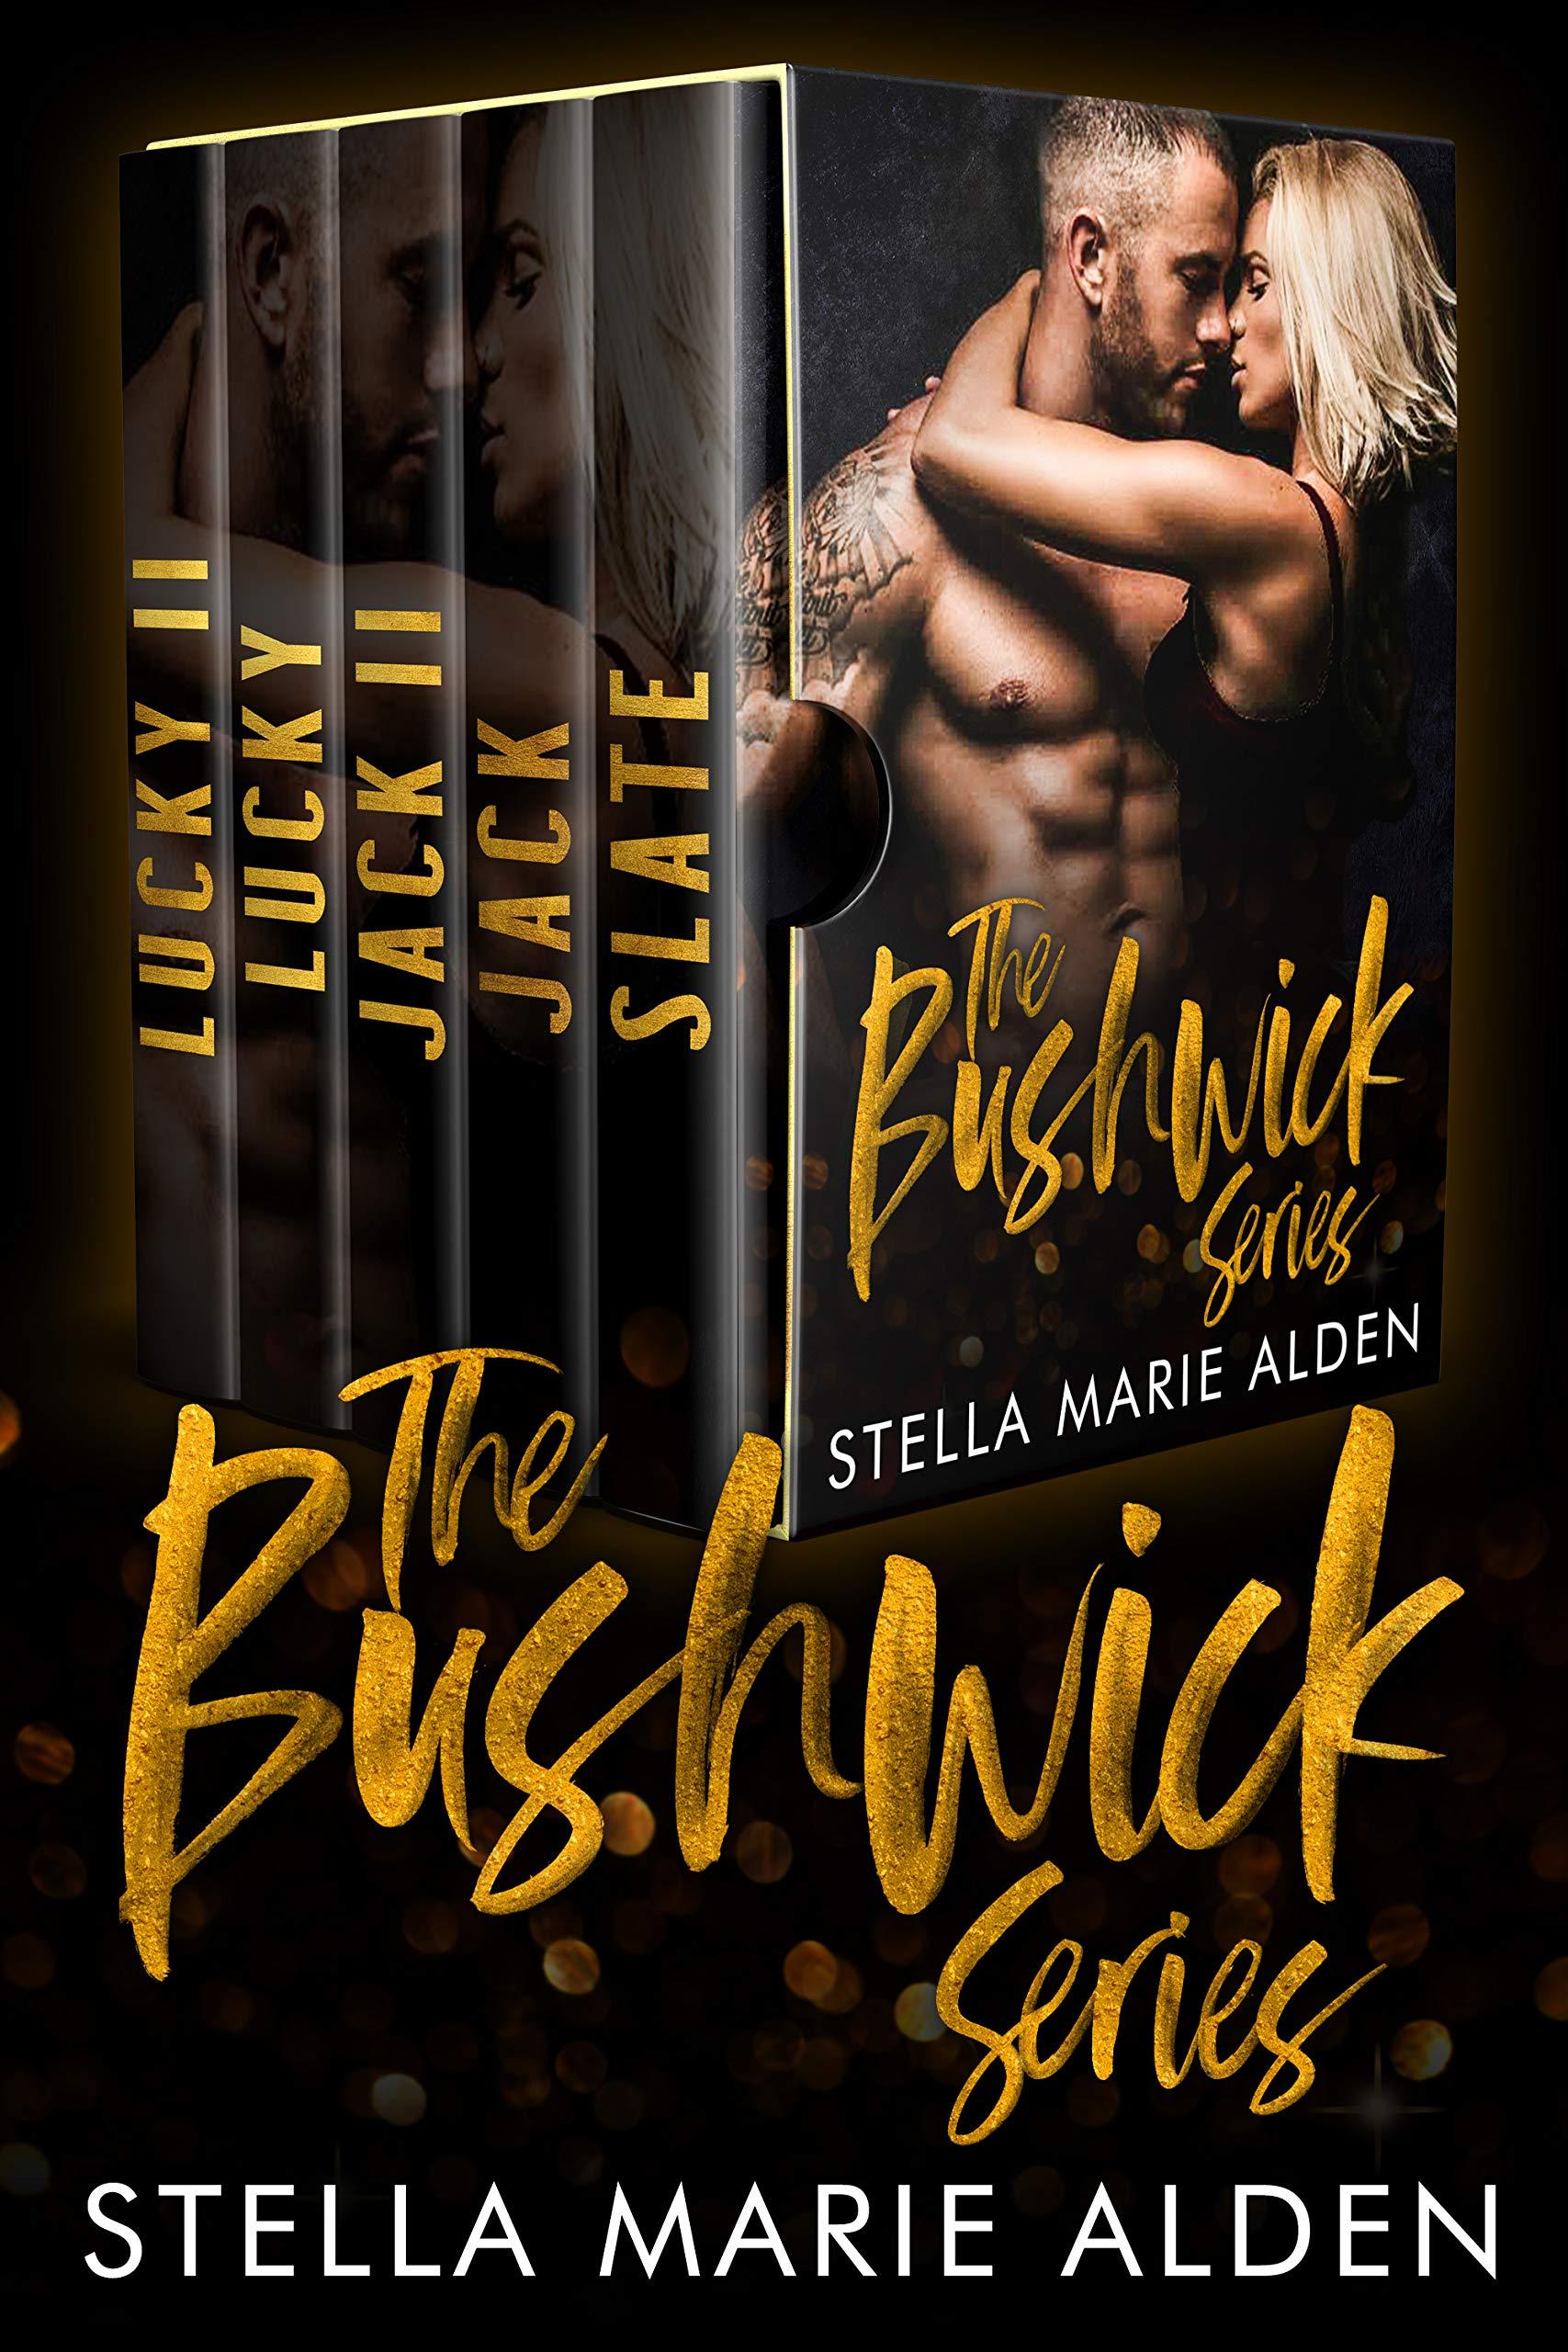 The Bushwick Series: Patten Bodyguards, Books 1 - 6